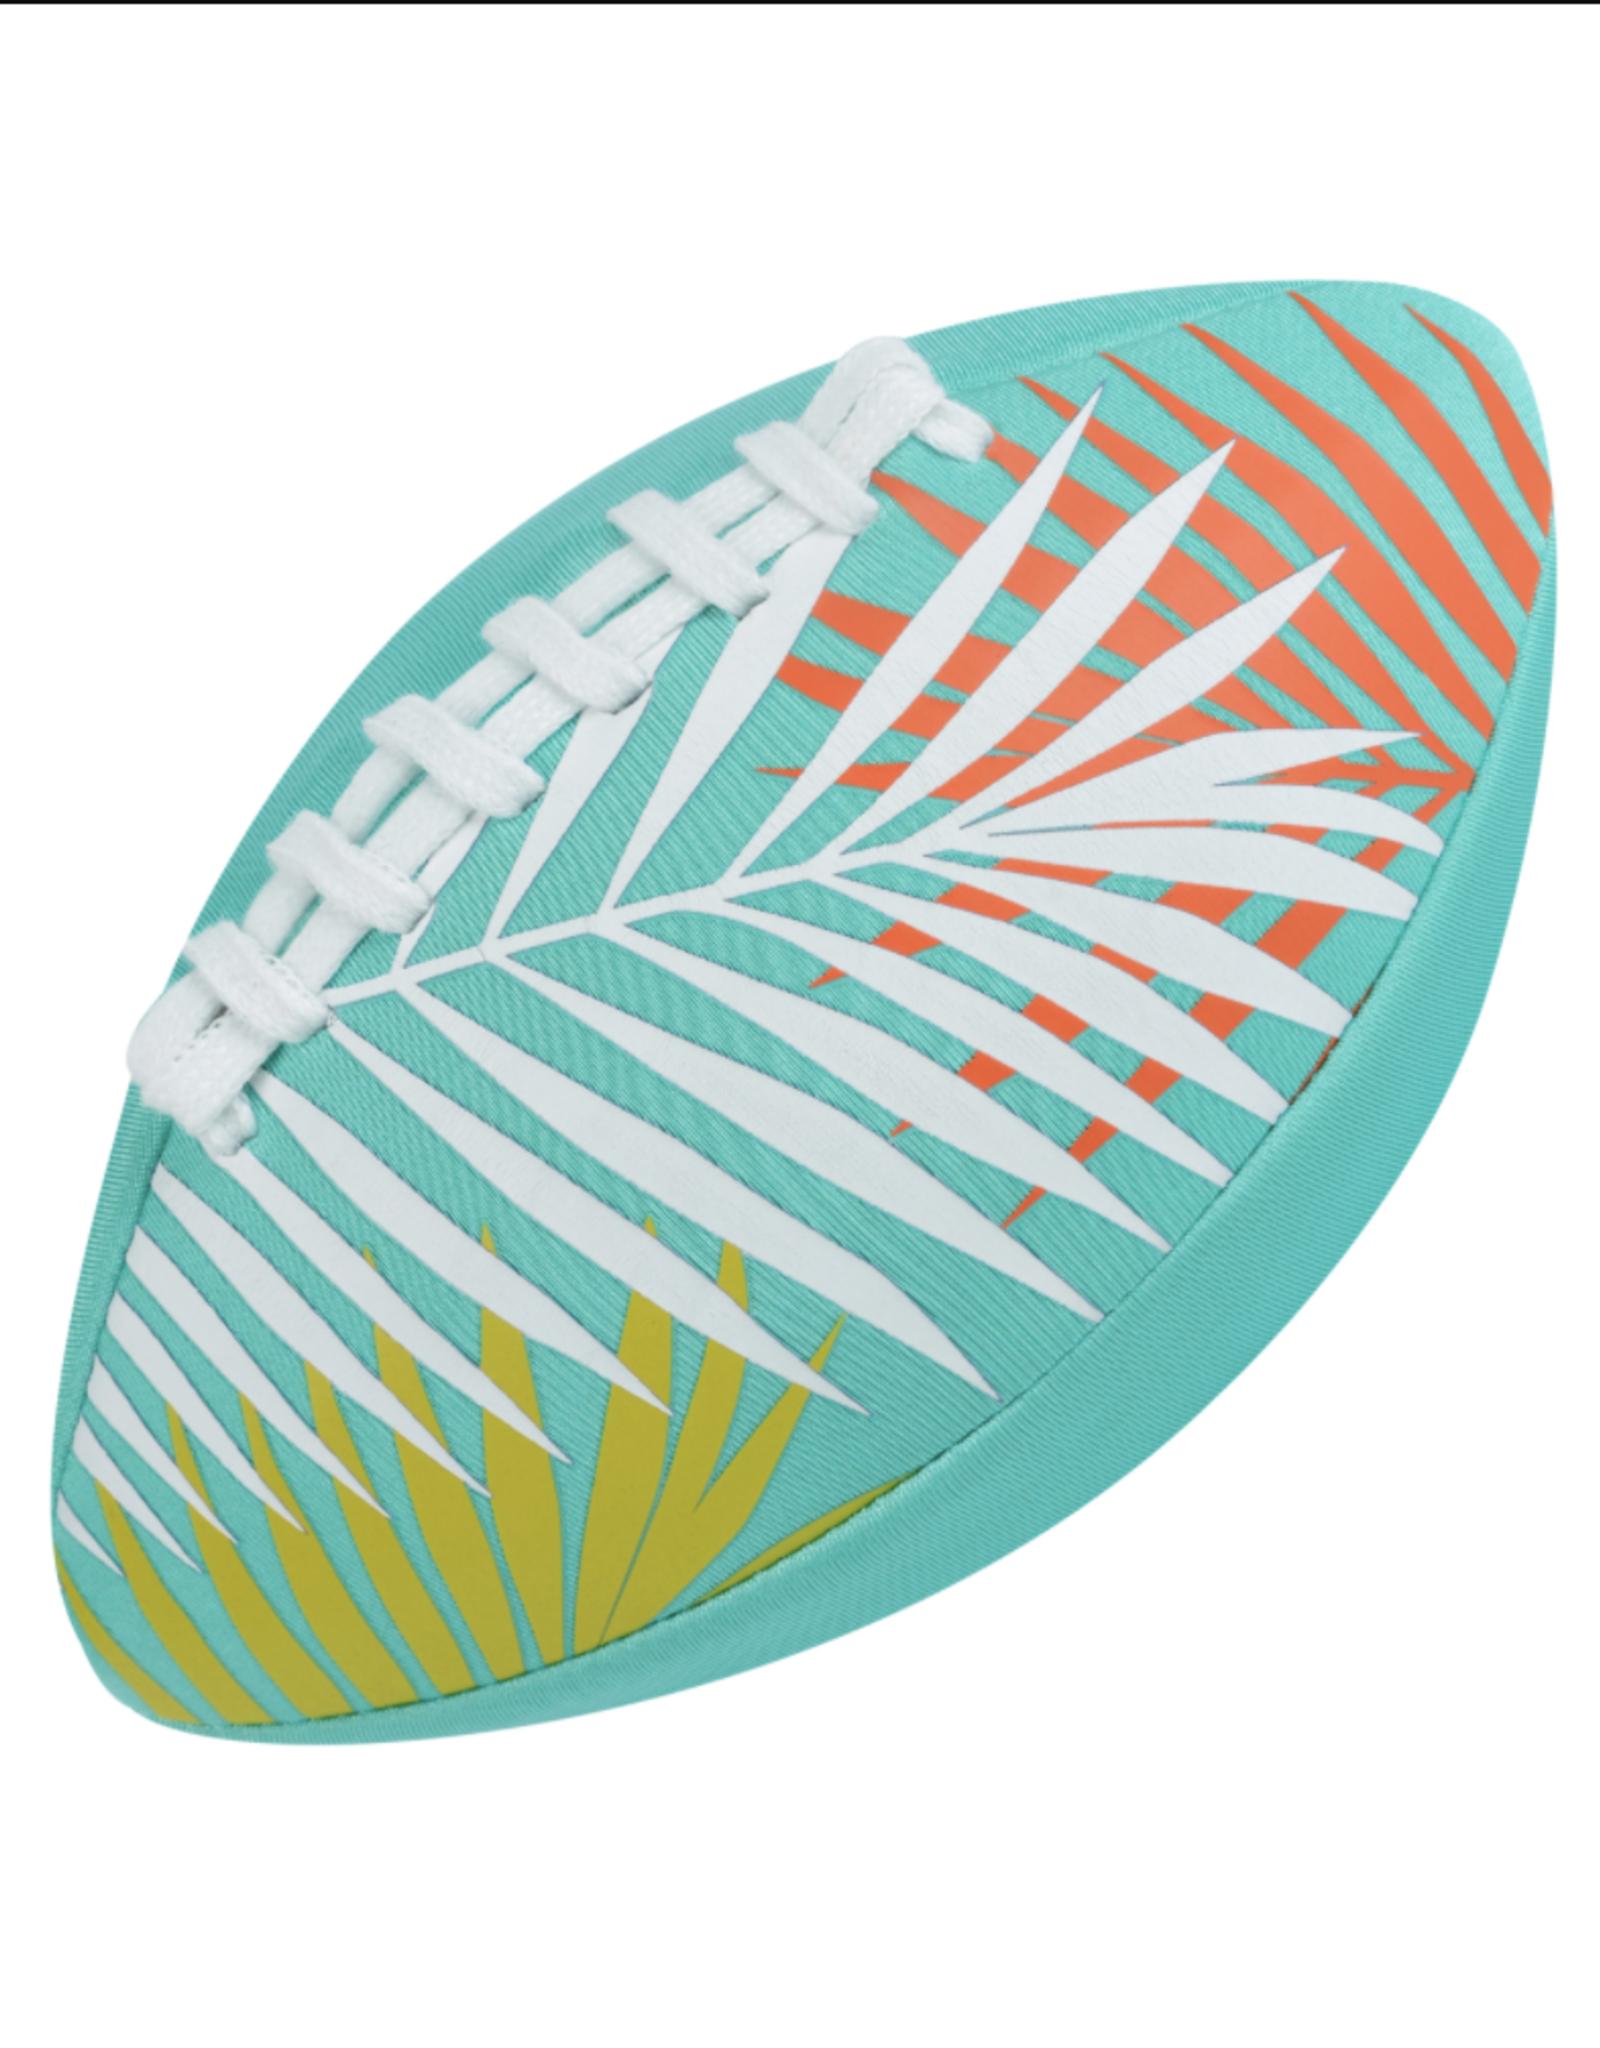 Waboba Waboba - 6 inch Football